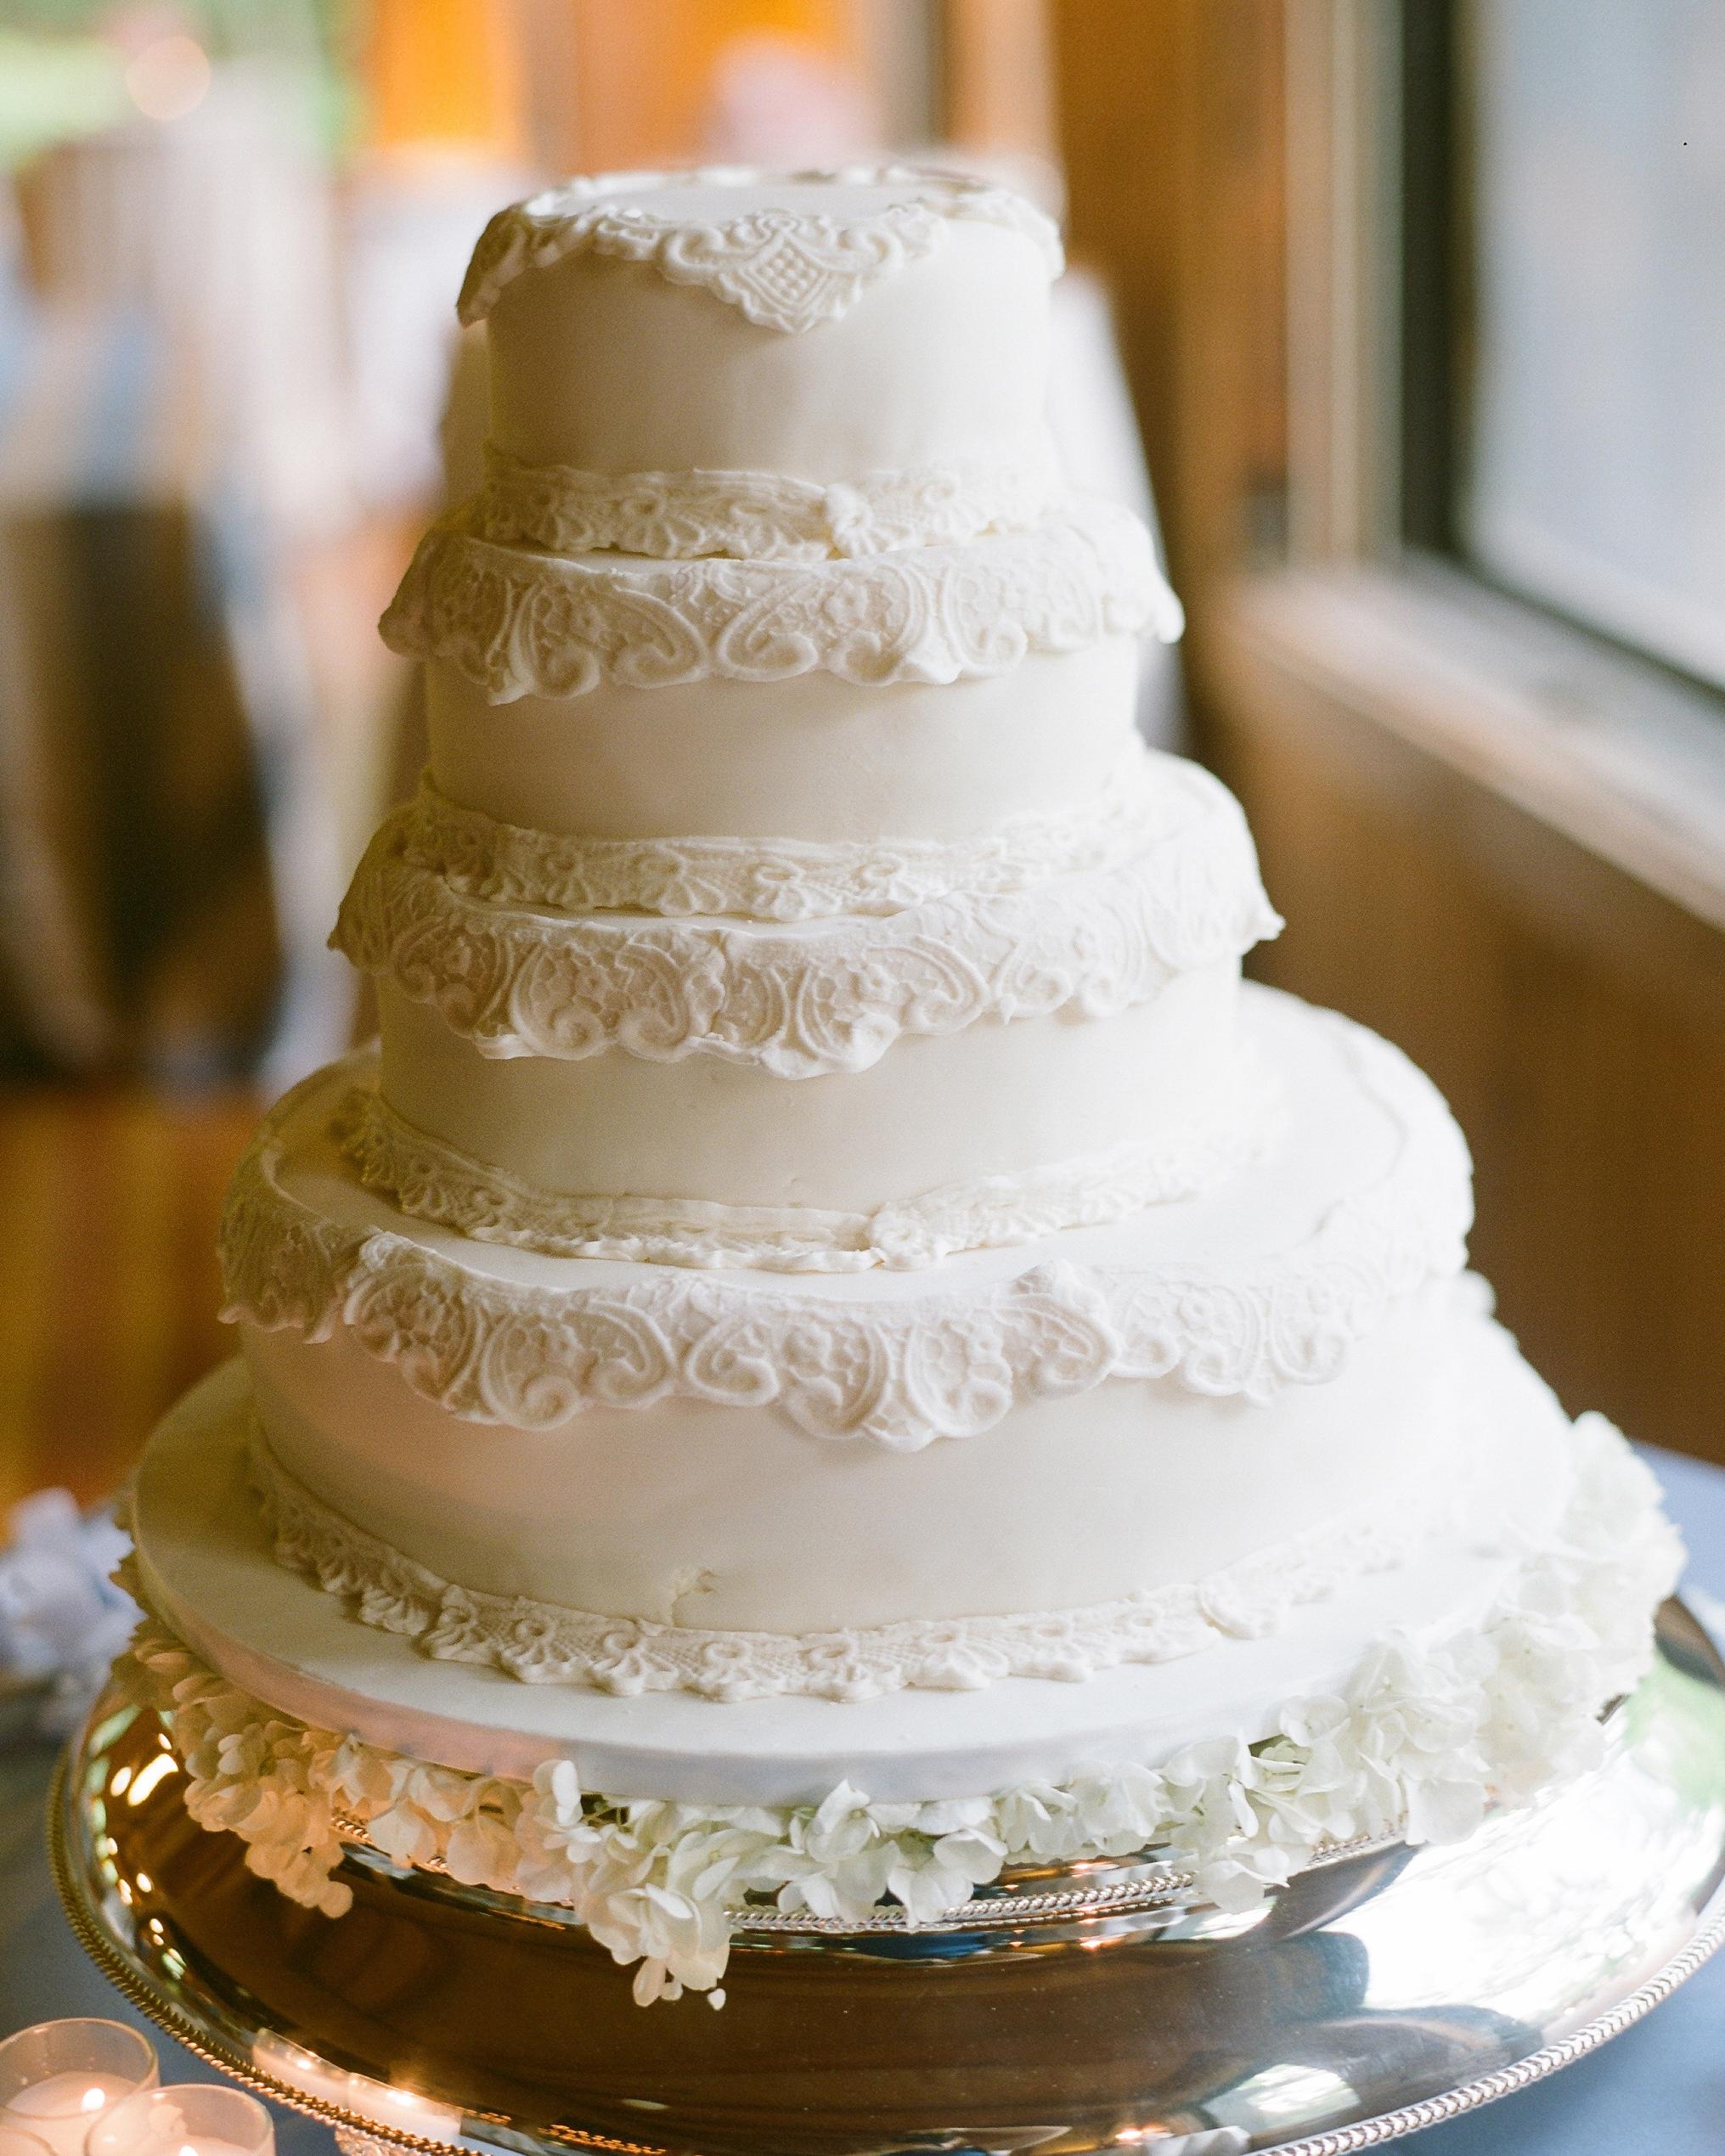 polly-rob-wedding-cake-0514.jpg